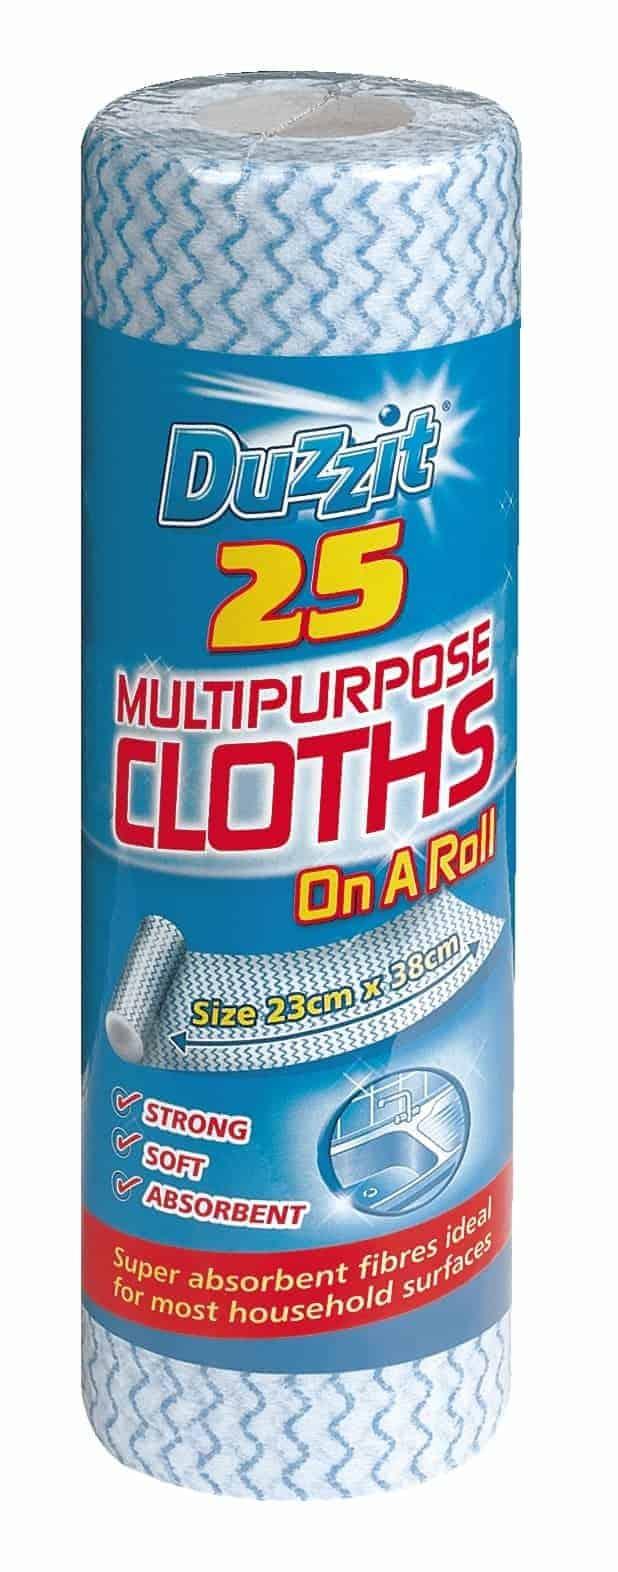 Duzzit 25pk Multi-Purpose Cloths On Roll